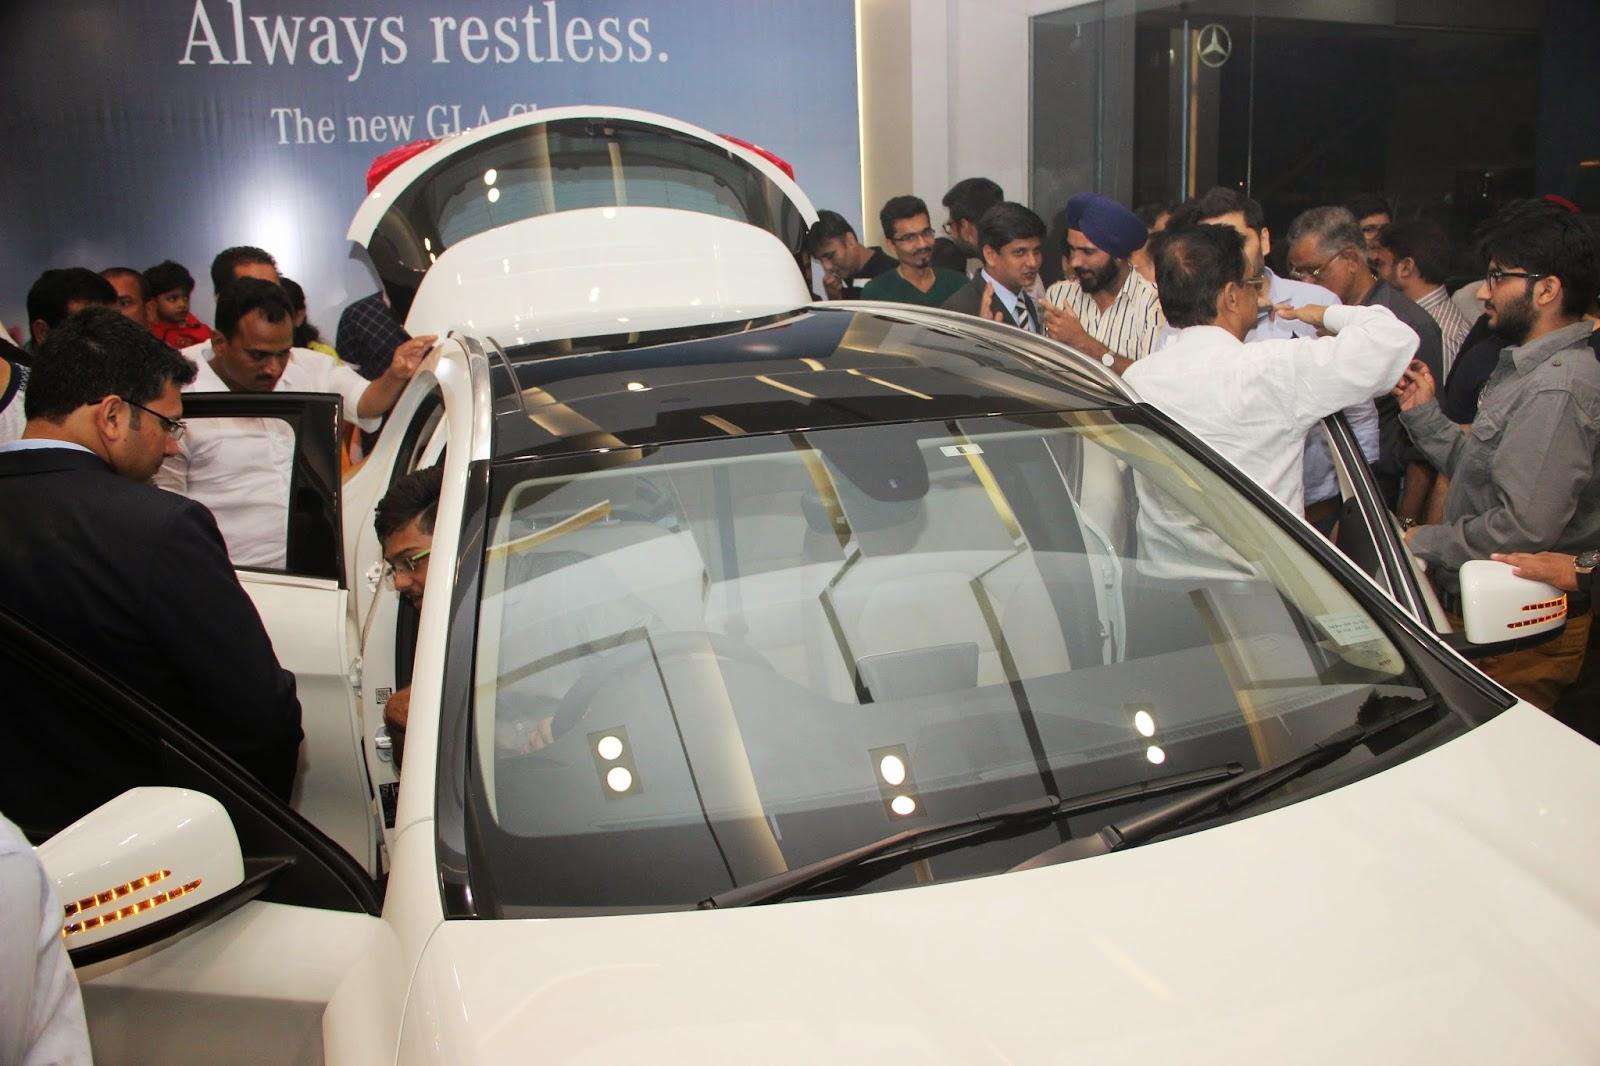 Mercedes Benz GLA-Class Preview Launch at Shaman Wheels,Kalina